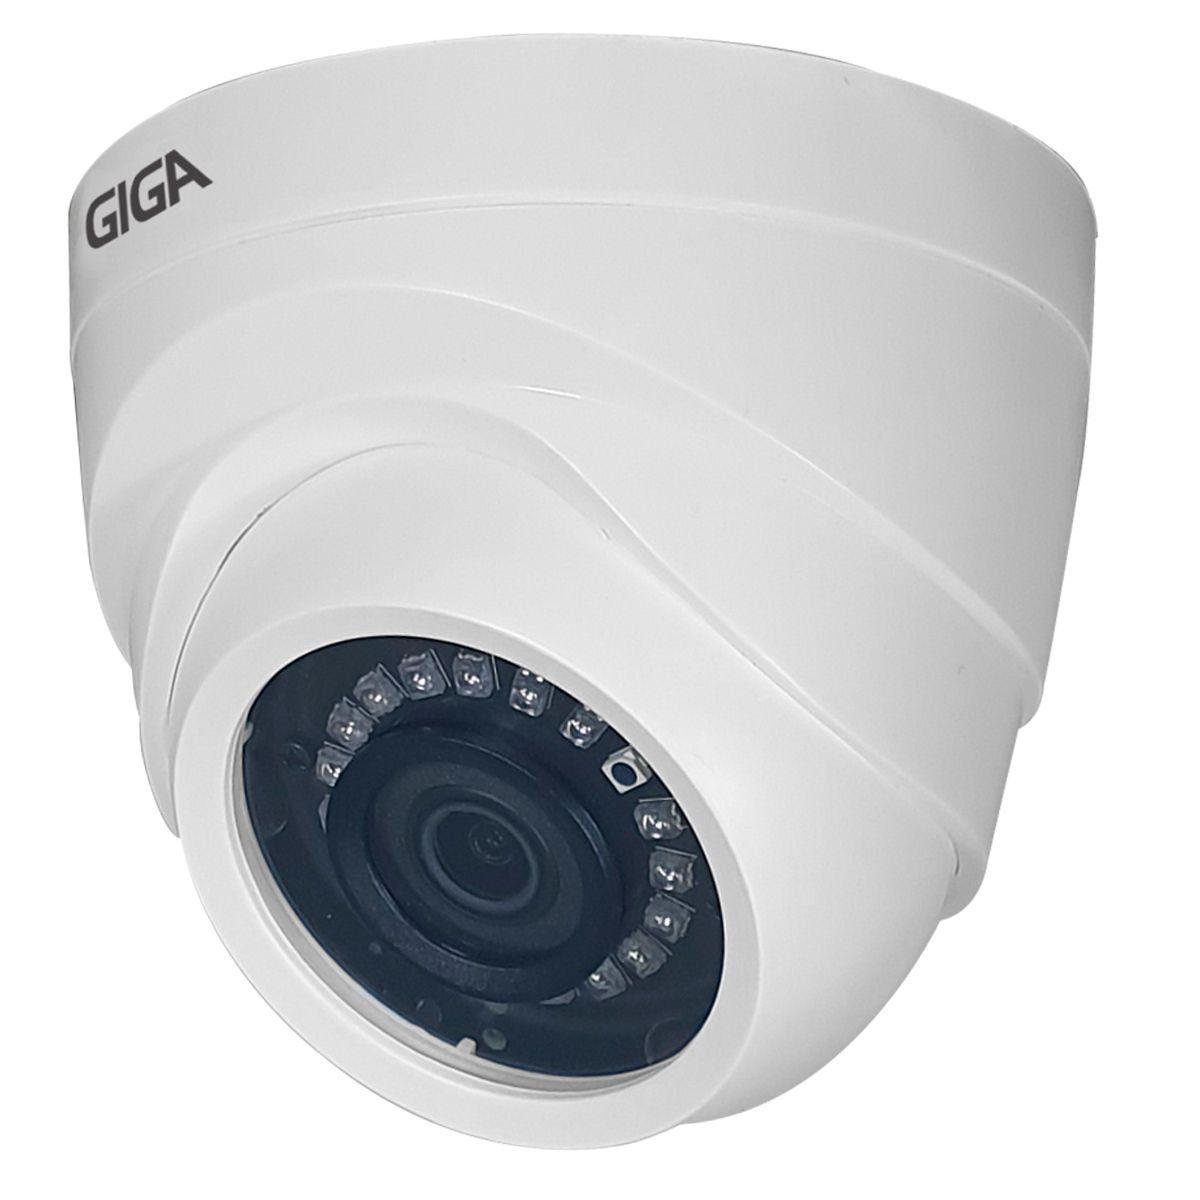 Câmera Dome Giga Open Hd Orion Full Hd 20 Metros 3.6MM GS0270